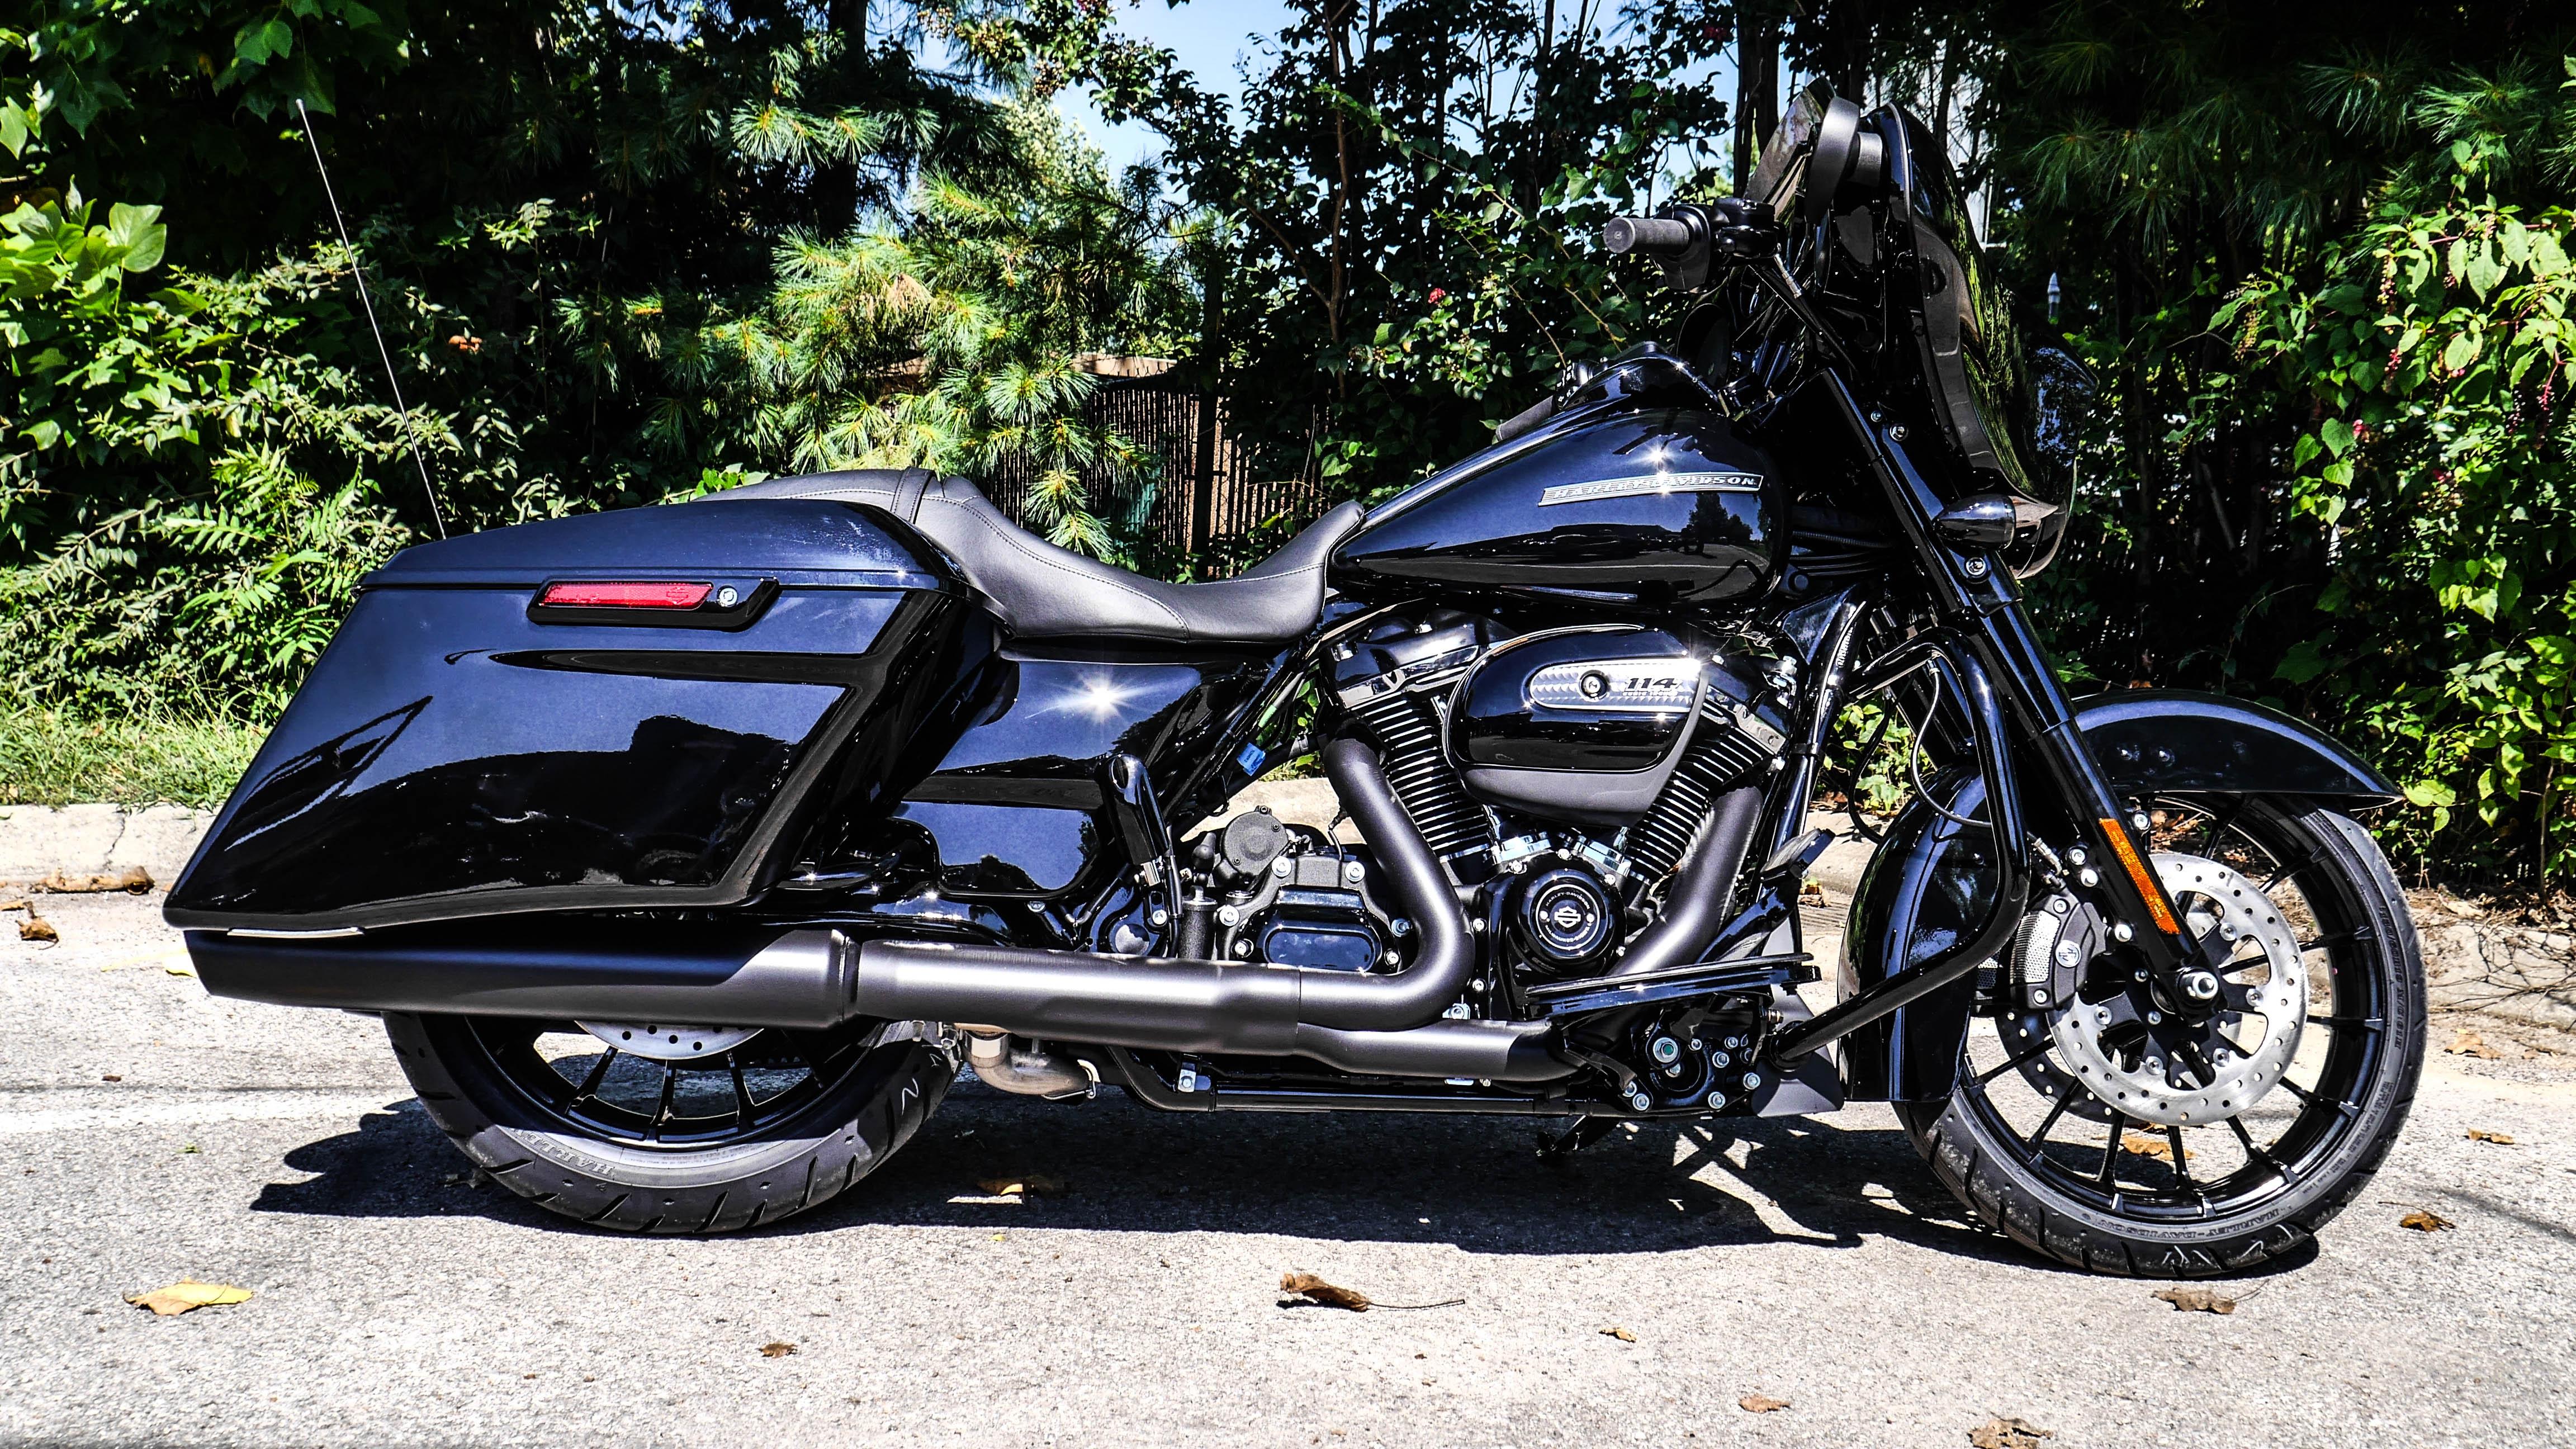 New 2020 Harley-Davidson Street Glide Special